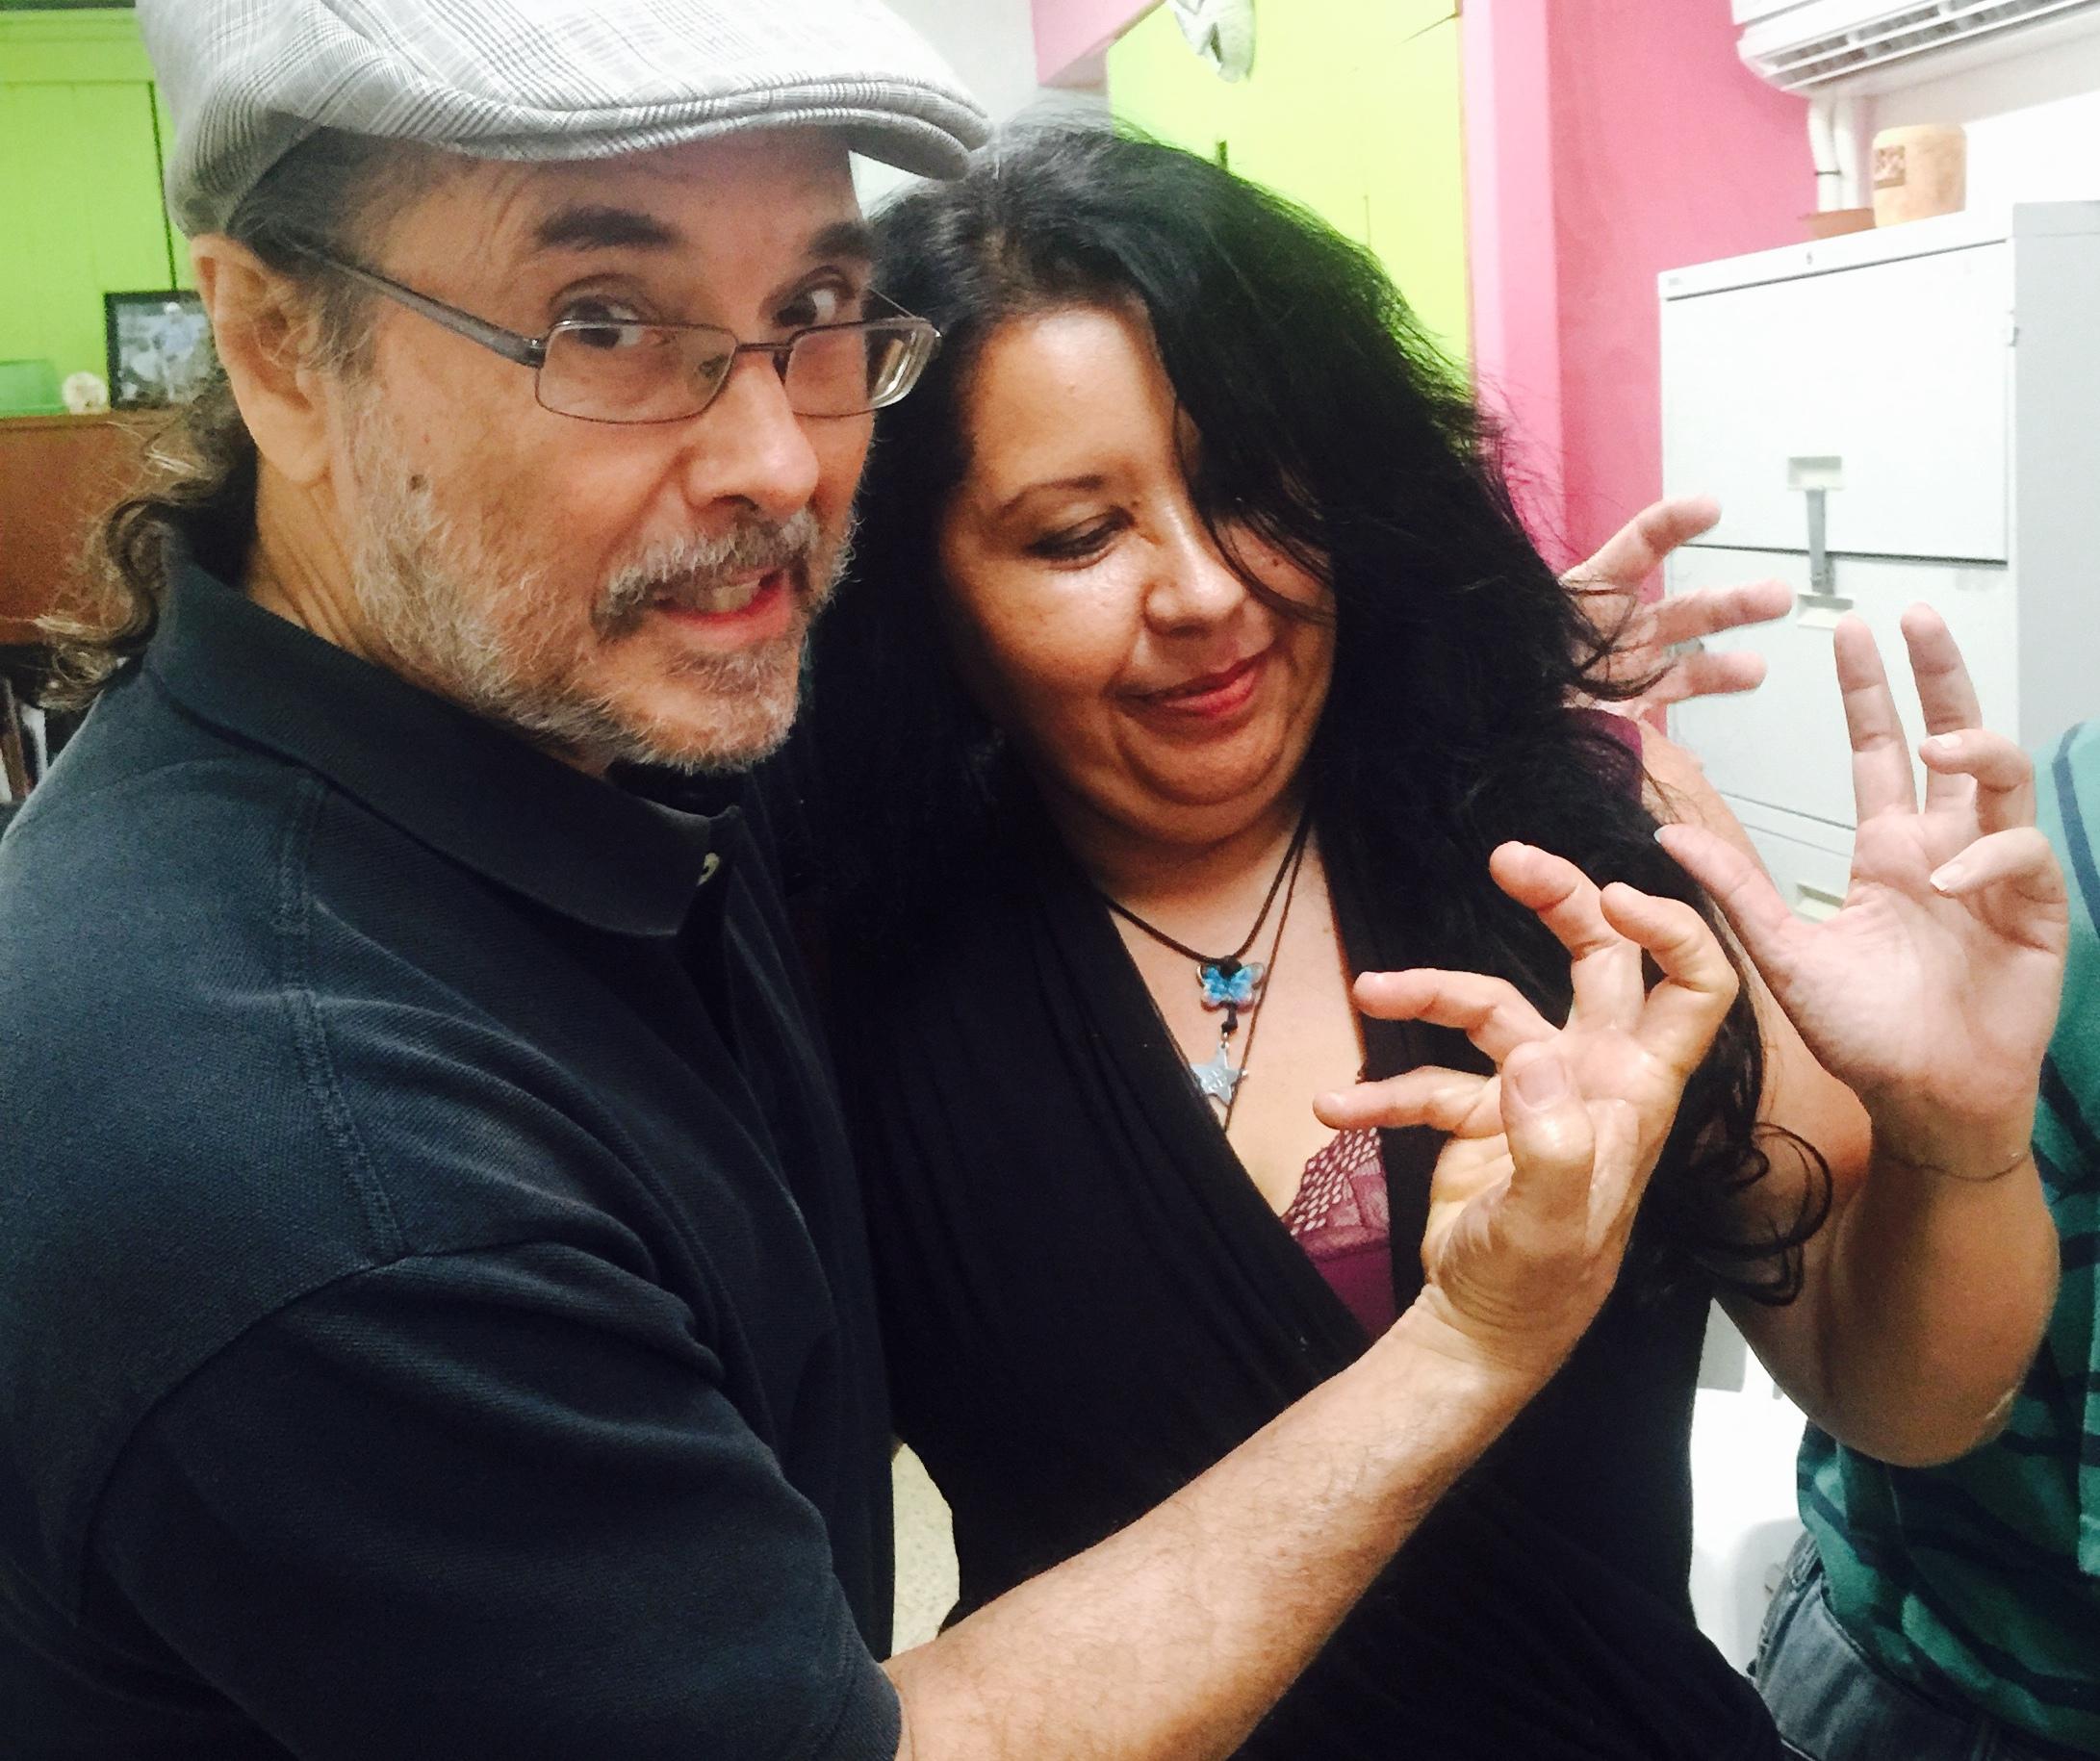 manos de la cultura edgar quiles foto alina marrero ag 2015 (3) - Copy